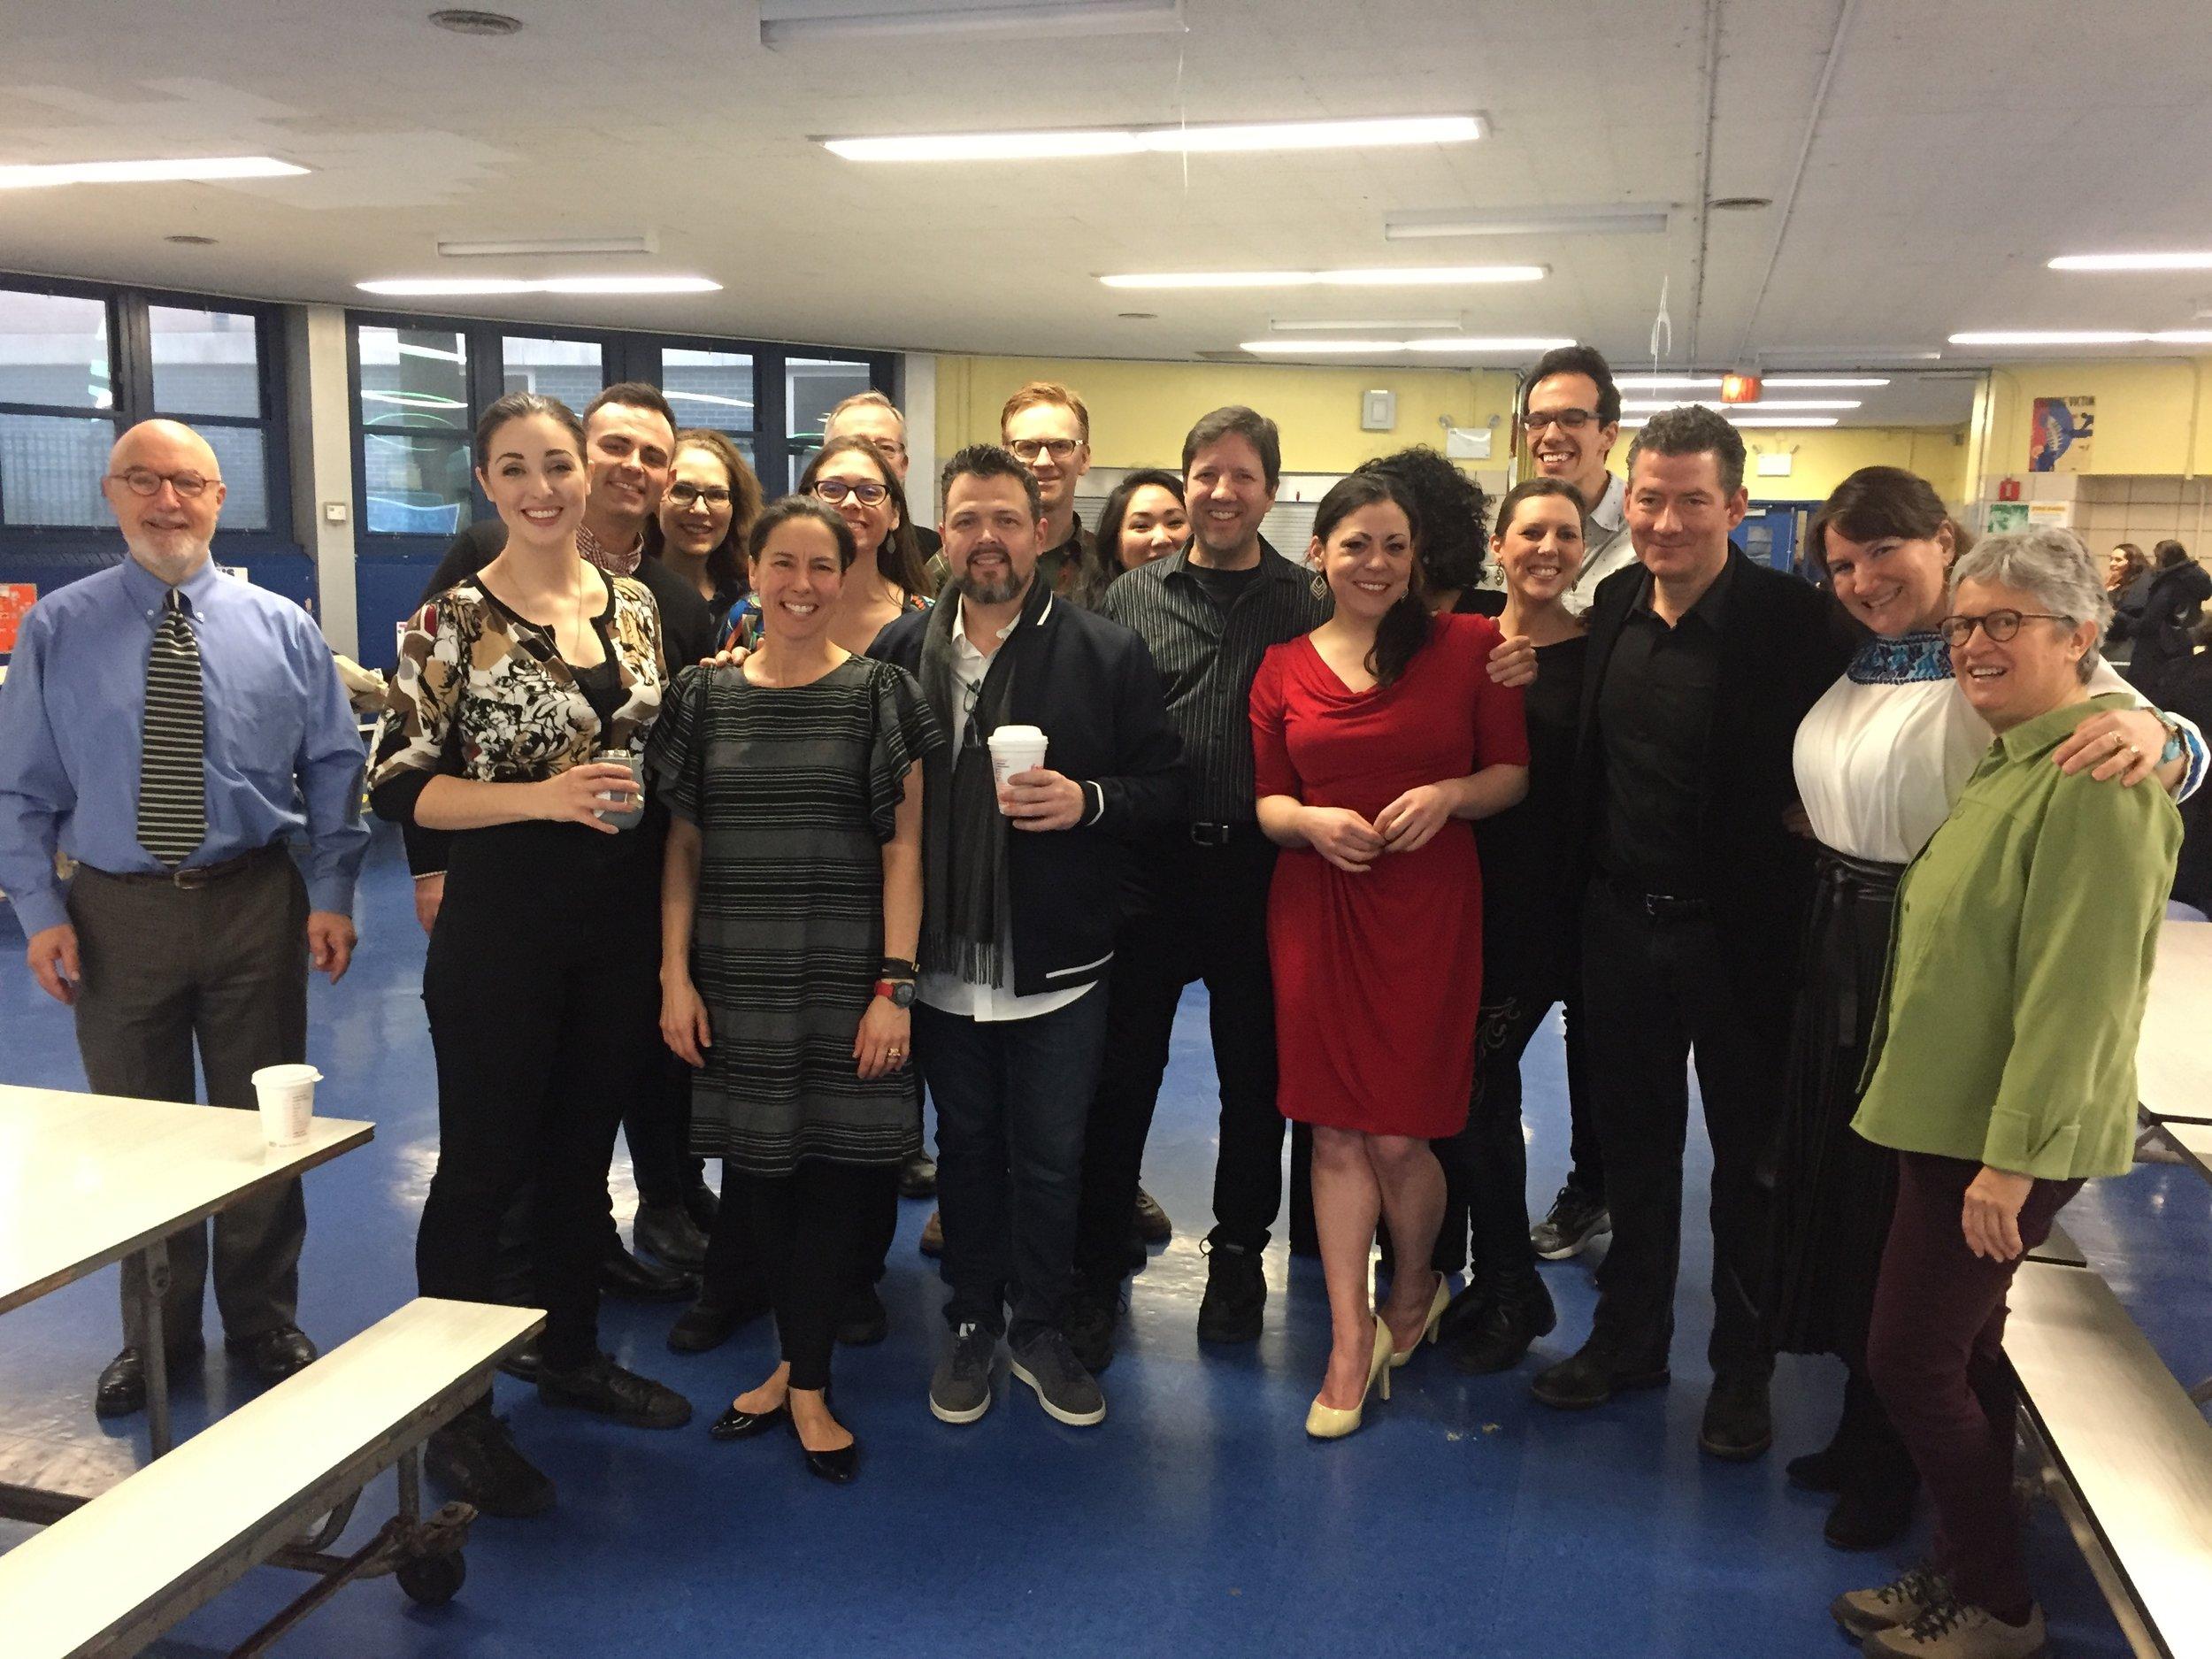 Members of the Met Opera Chorus with teachers from Castle Bridge Elementary School.